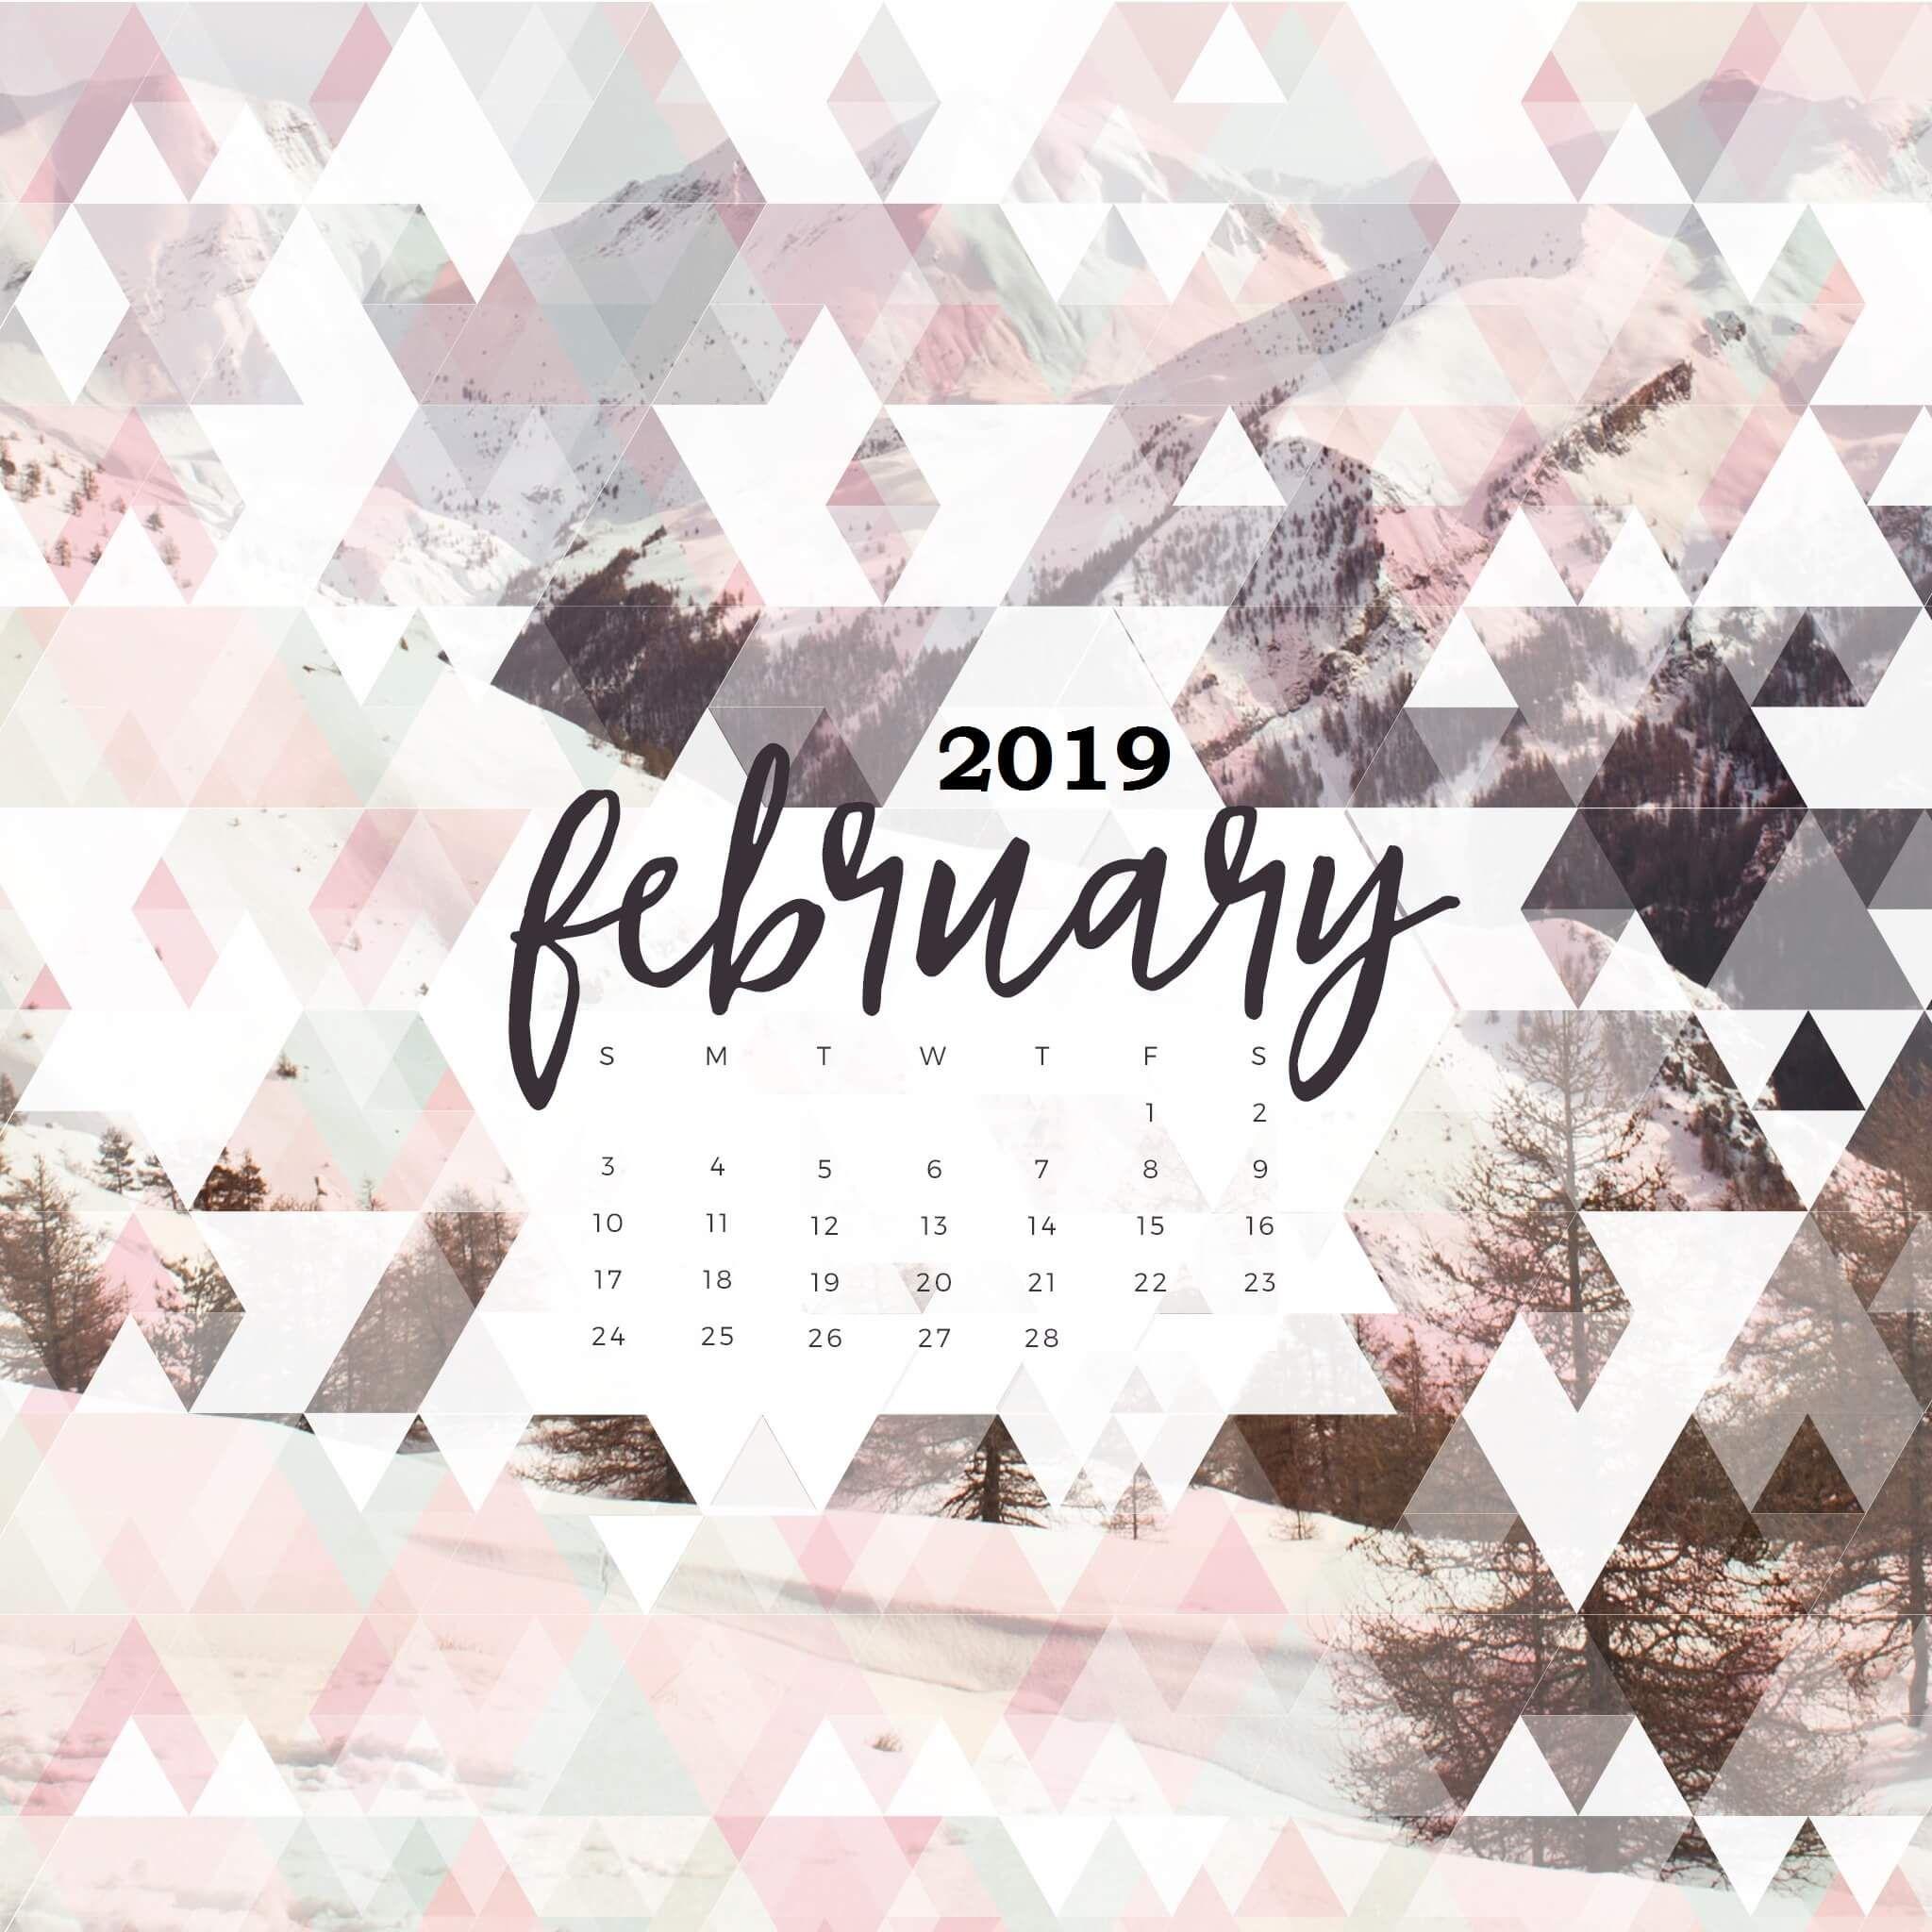 February 2019 Calendar Desktop February 2019 Desktop Calendar Wallpaper #February2019